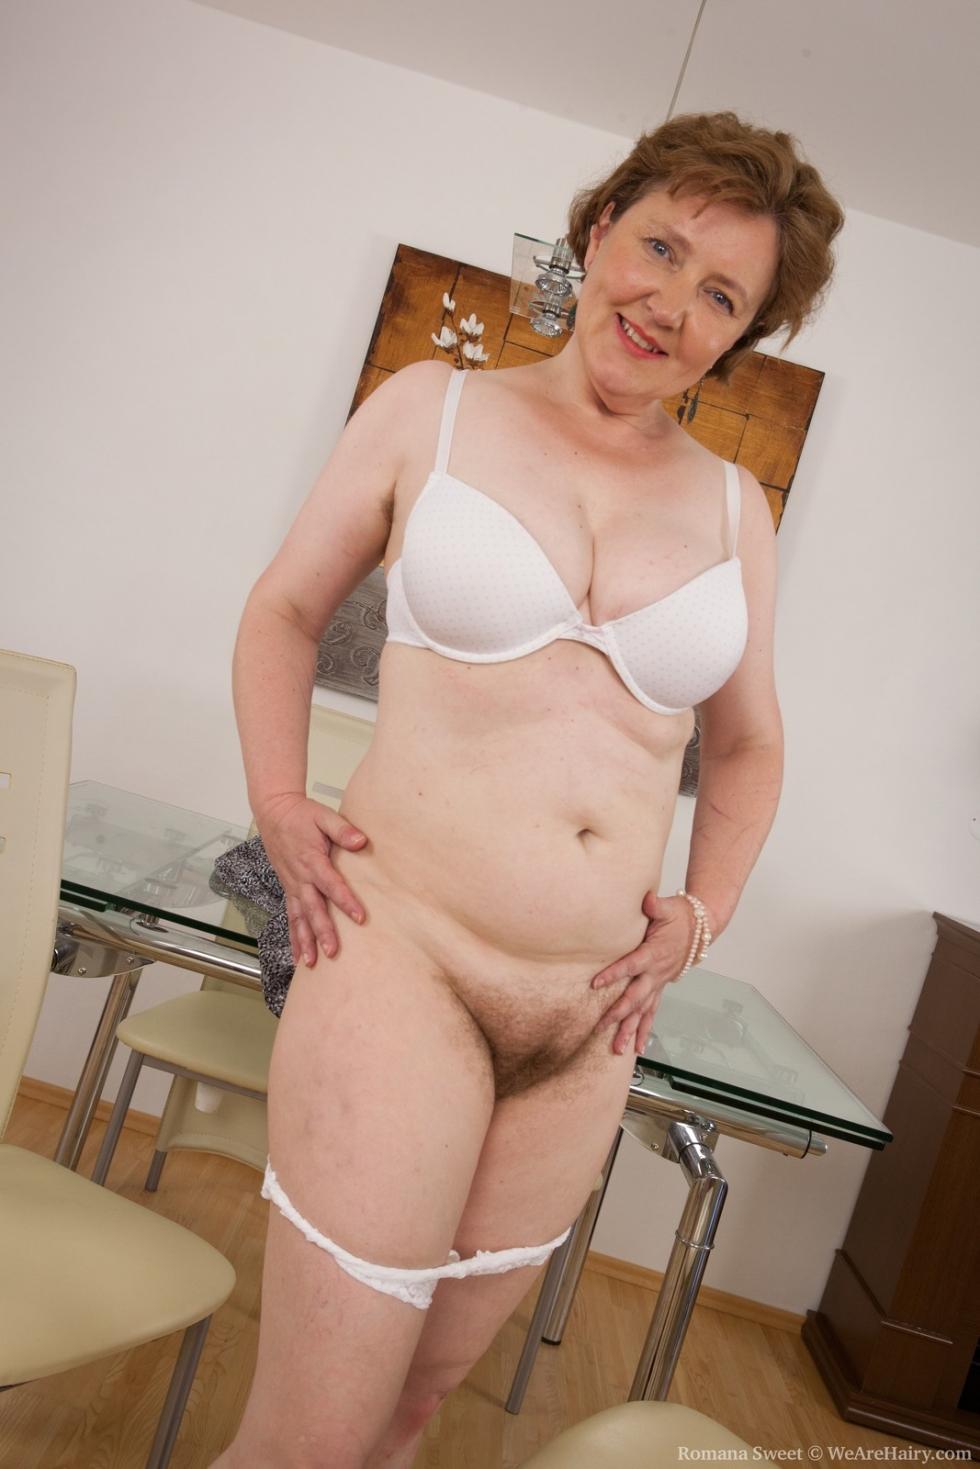 Wearehairy Romana Sweet Mature Hairy Woman Romana Sweet -4519